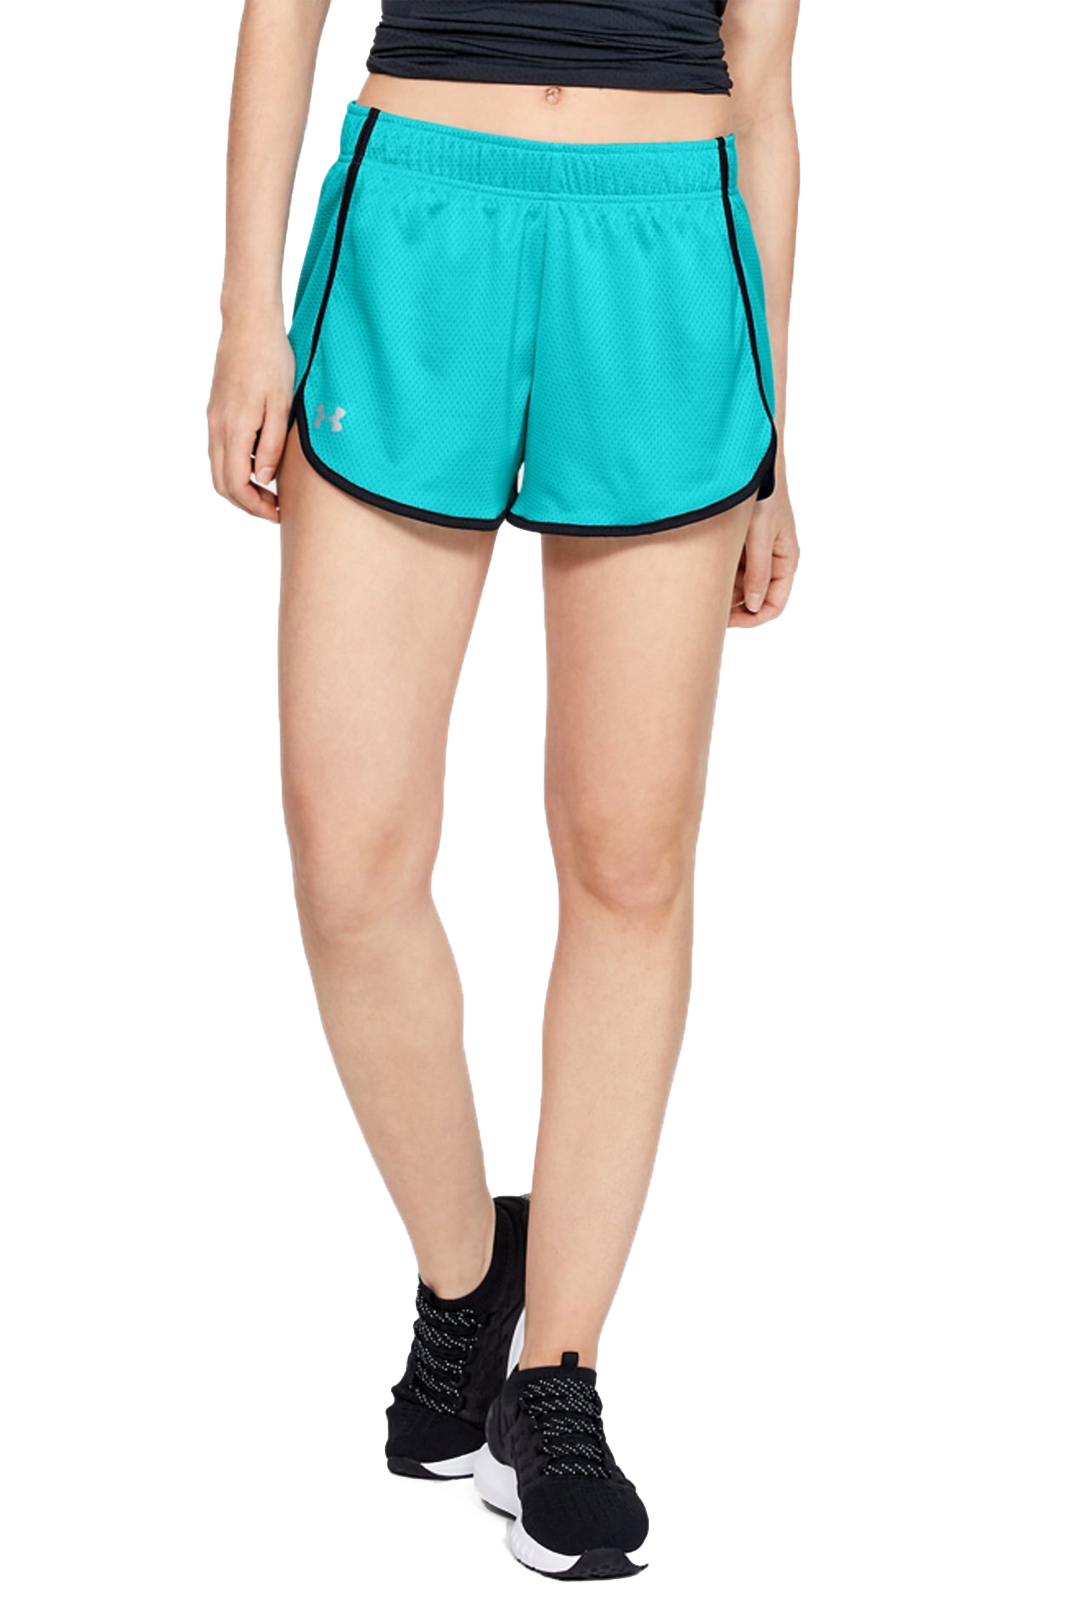 Shorts  Under armour UA1343591 400-BLUE